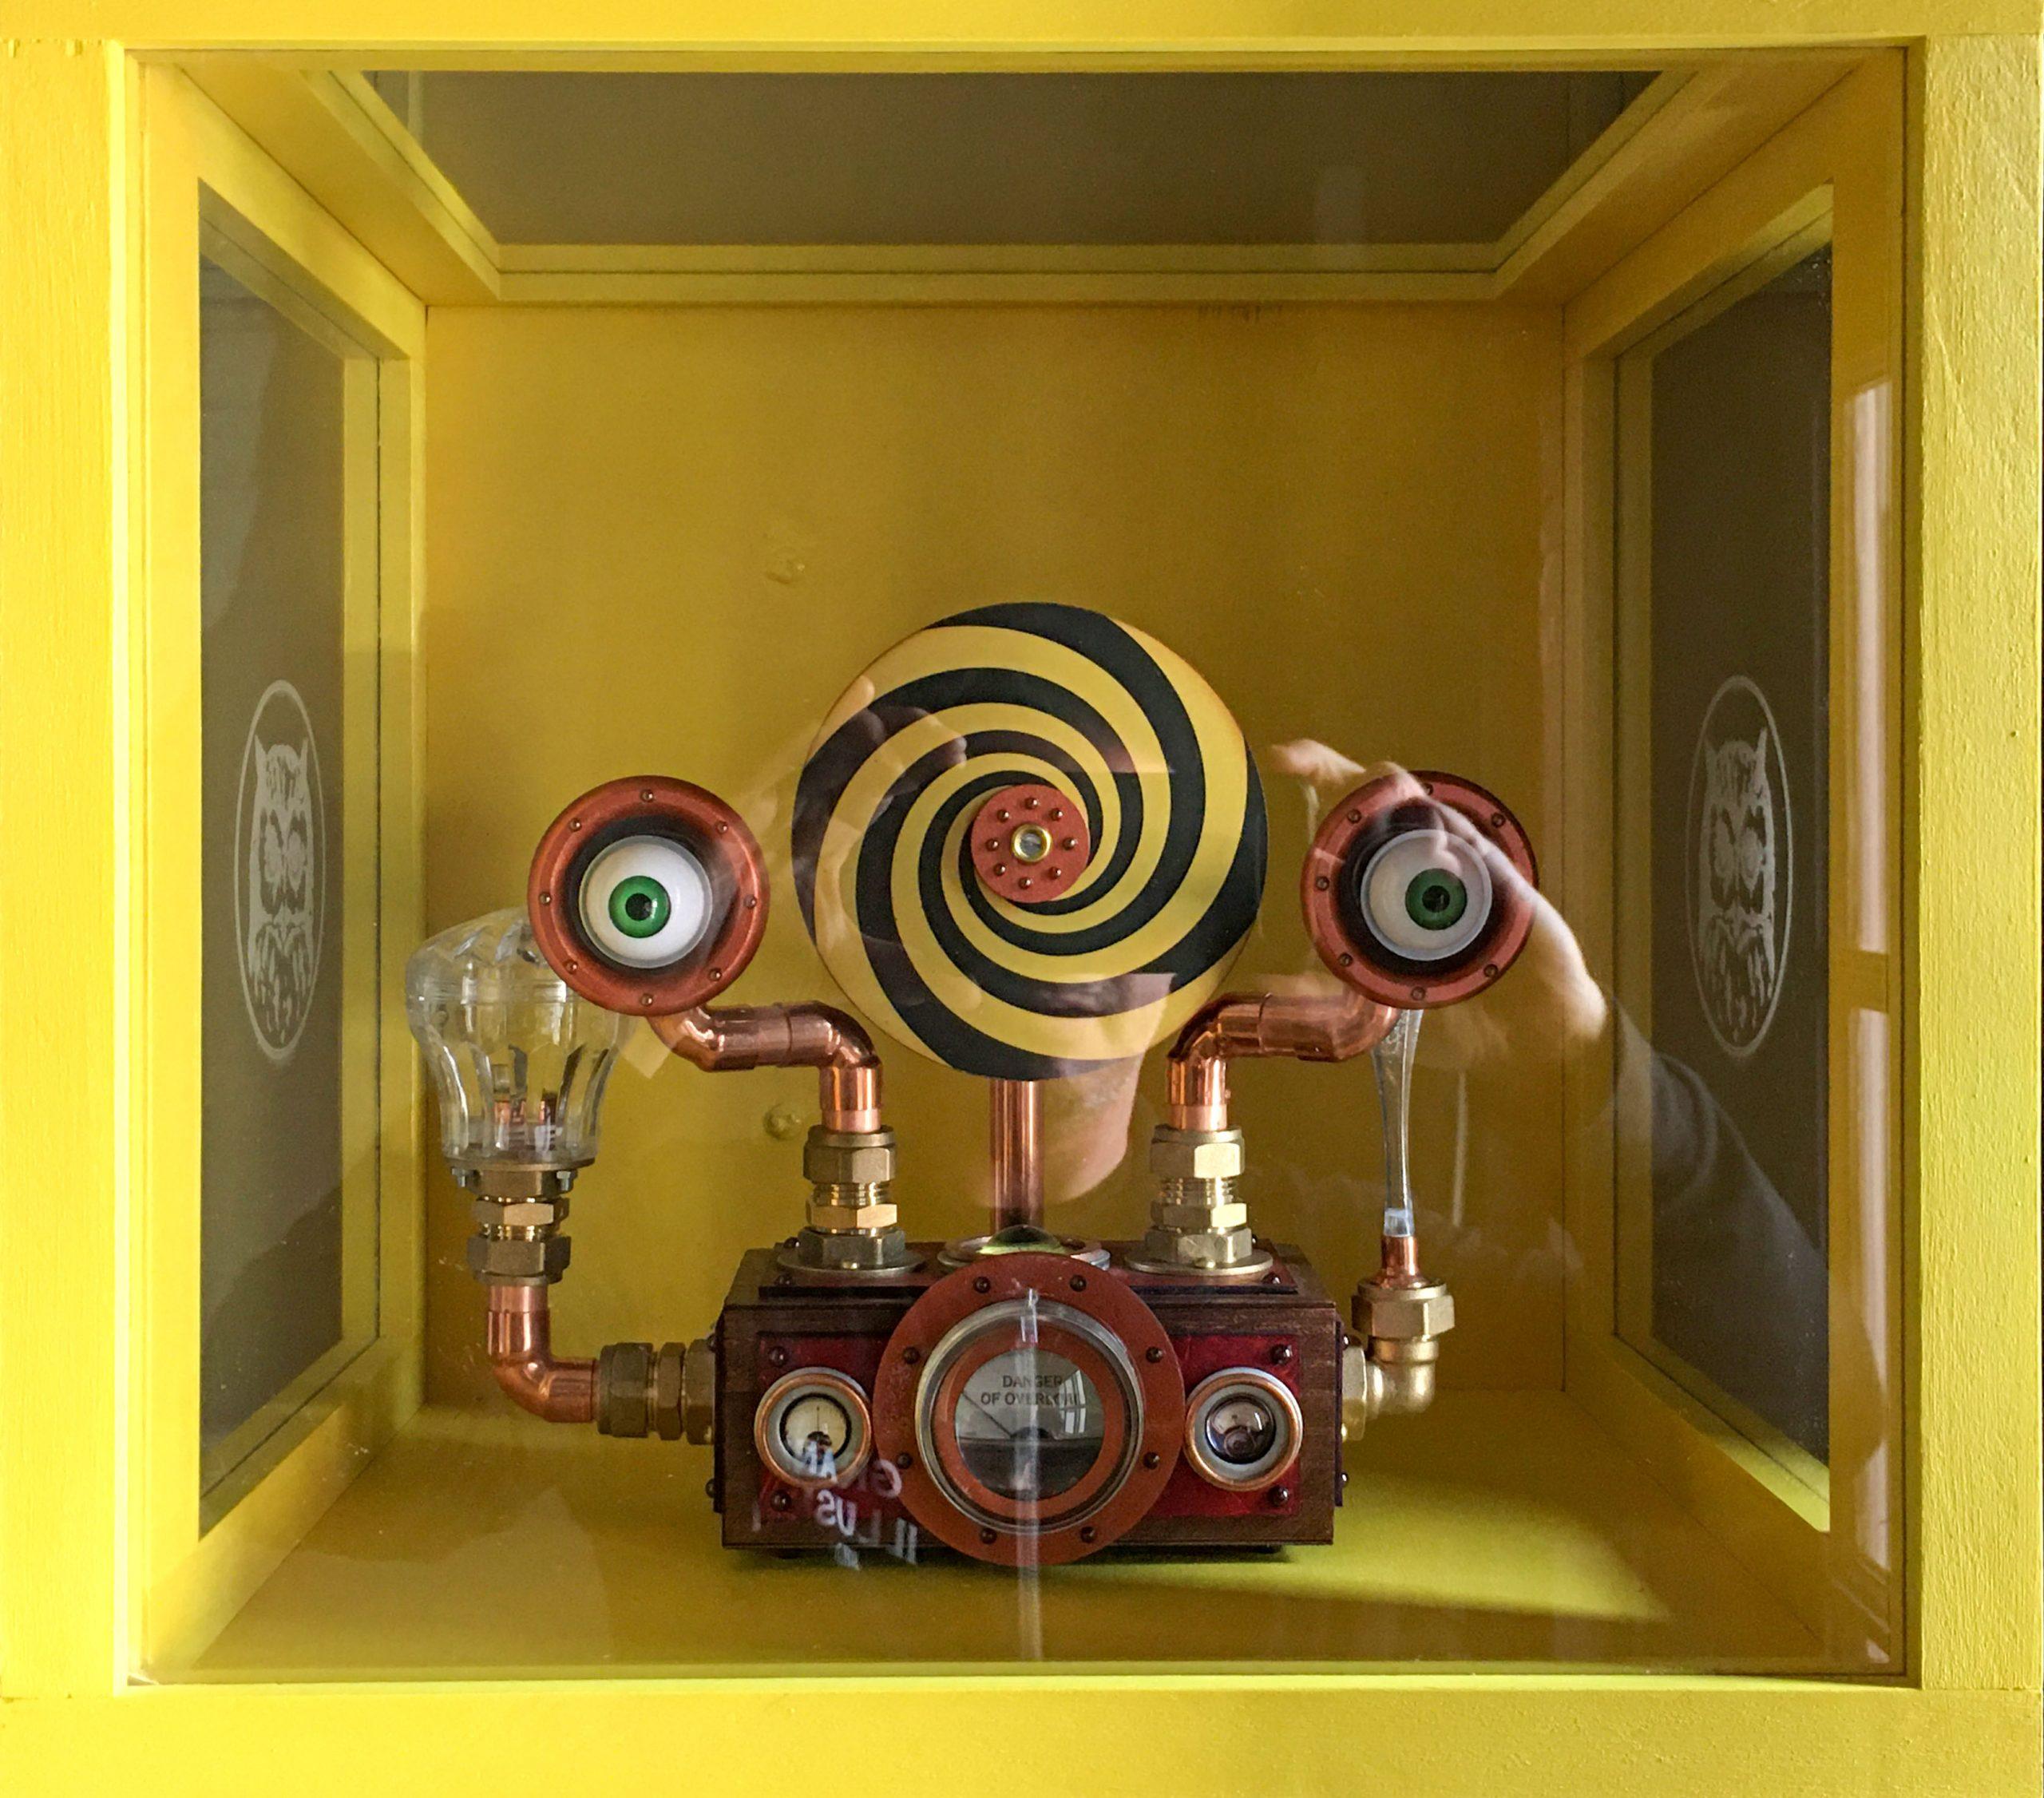 The Hypnotron